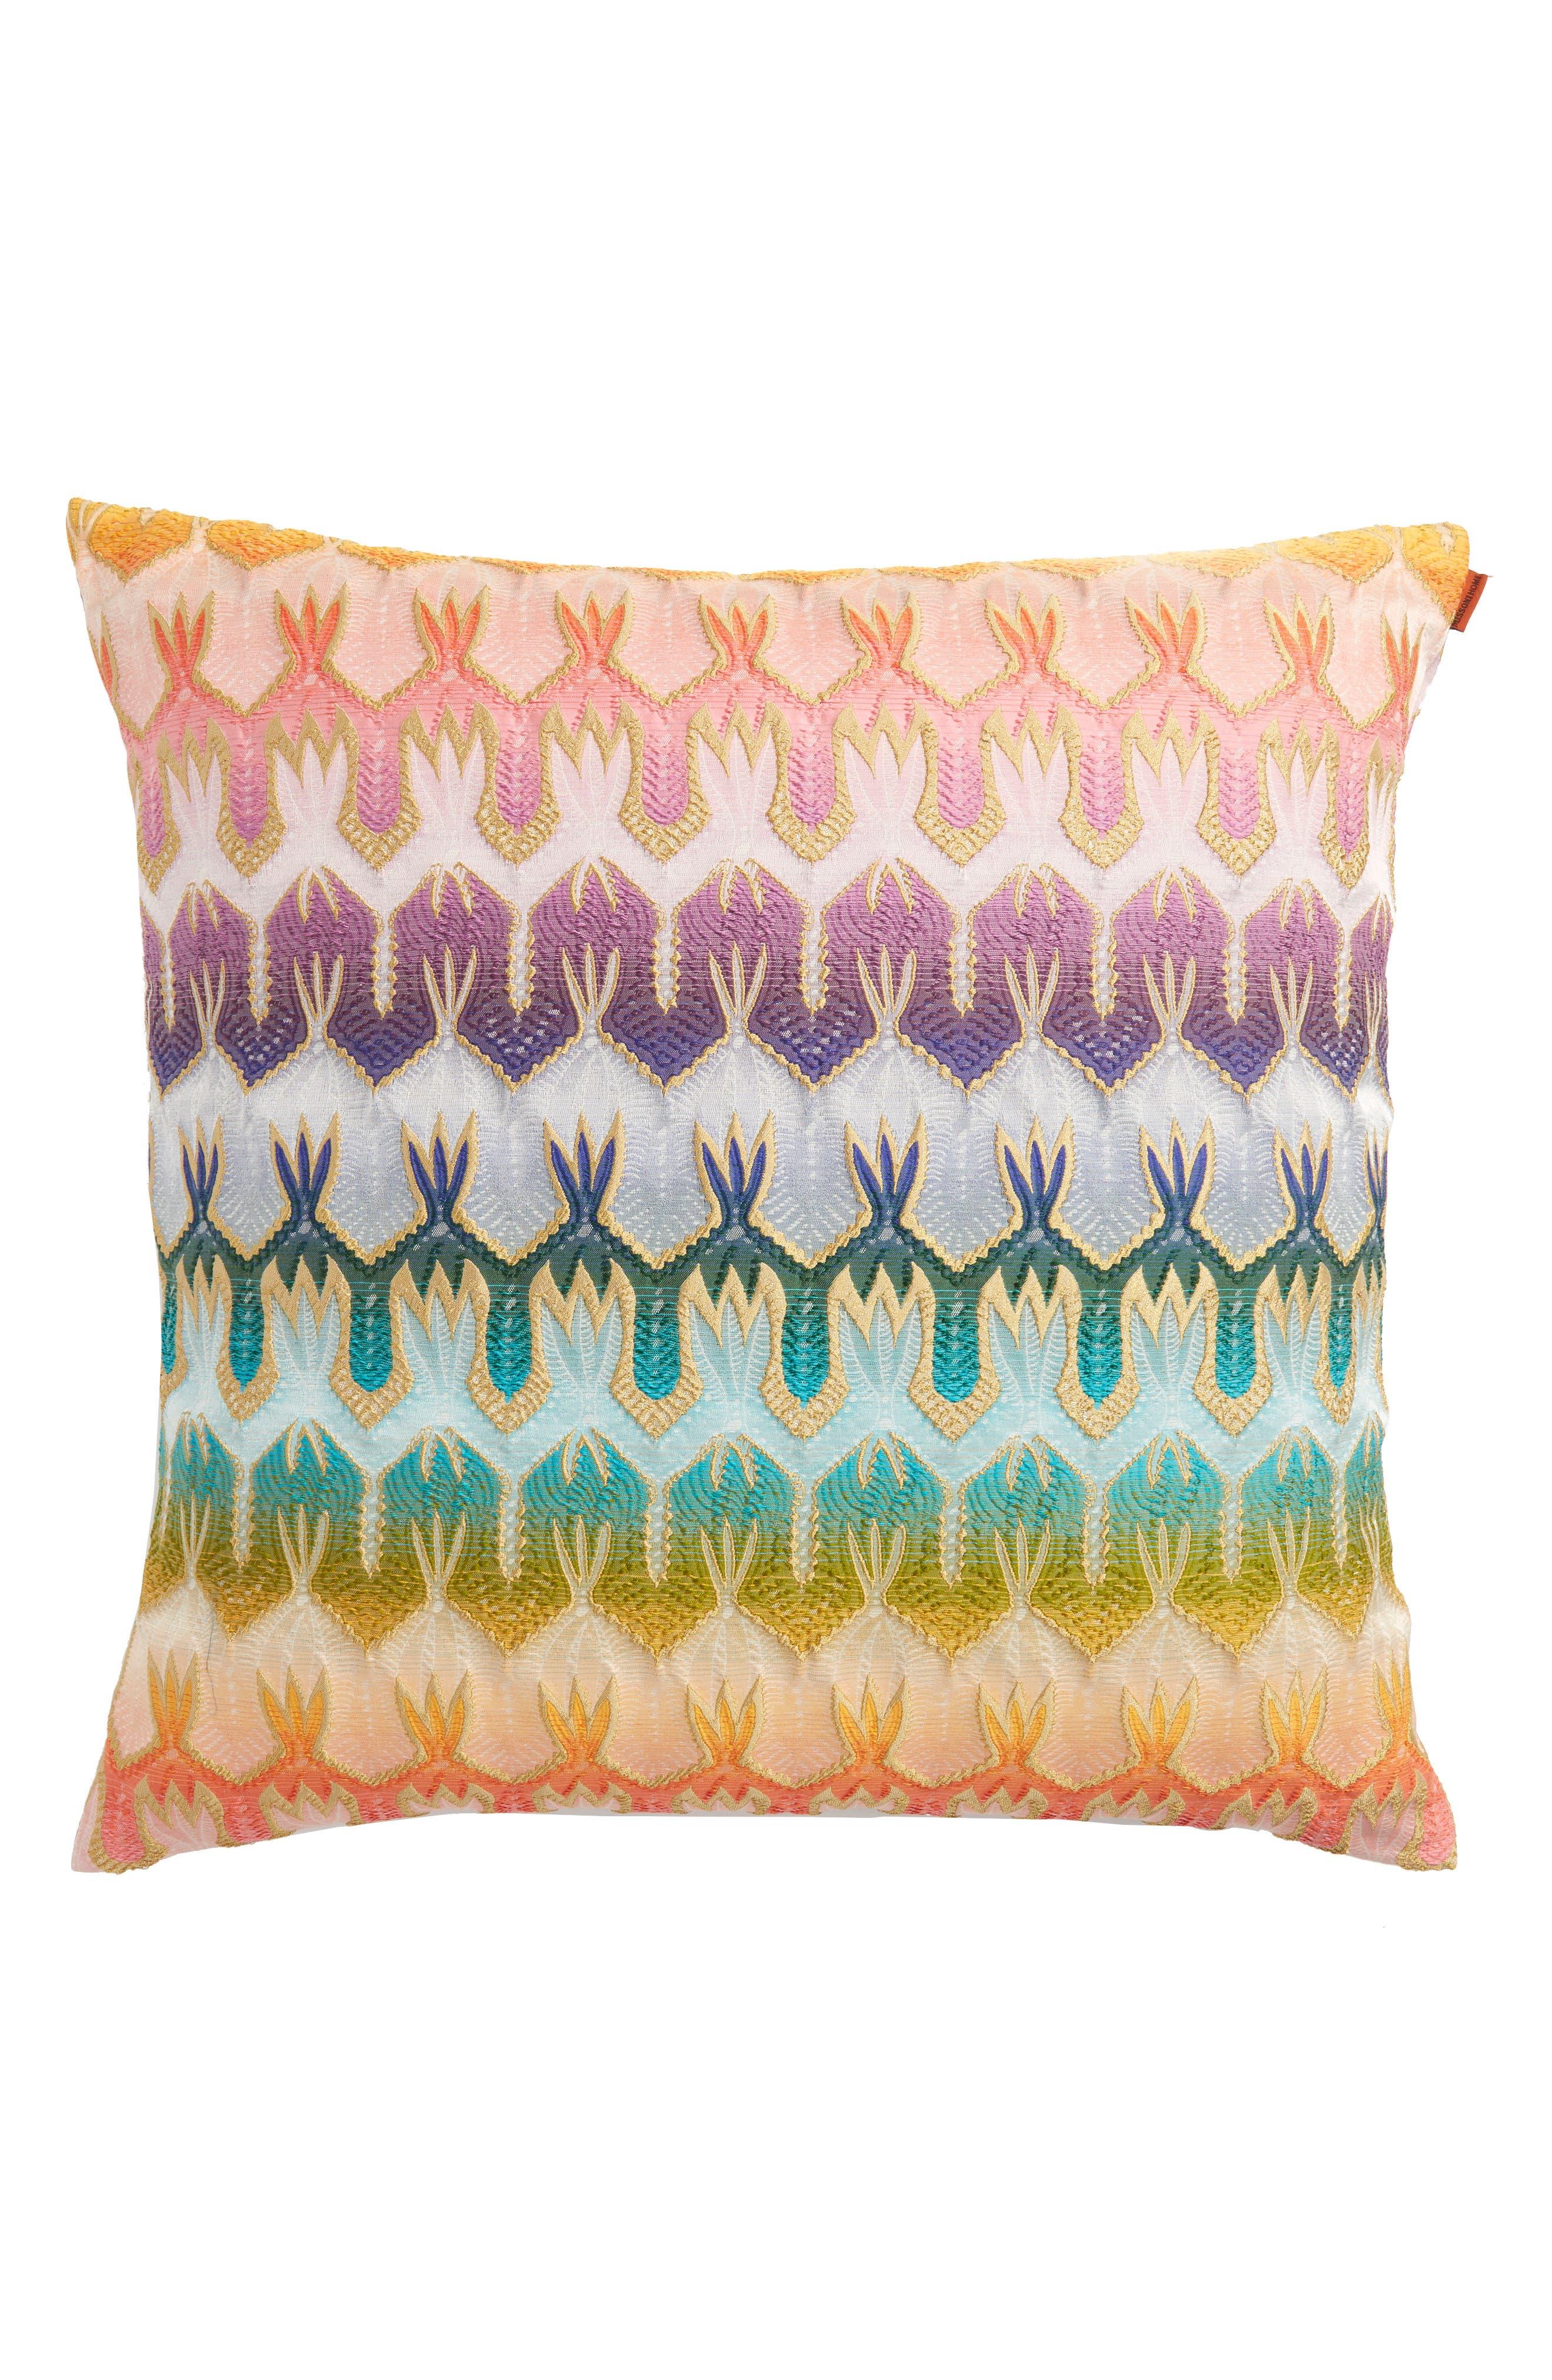 Pasadena Accent Pillow,                             Alternate thumbnail 2, color,                             Multi Color